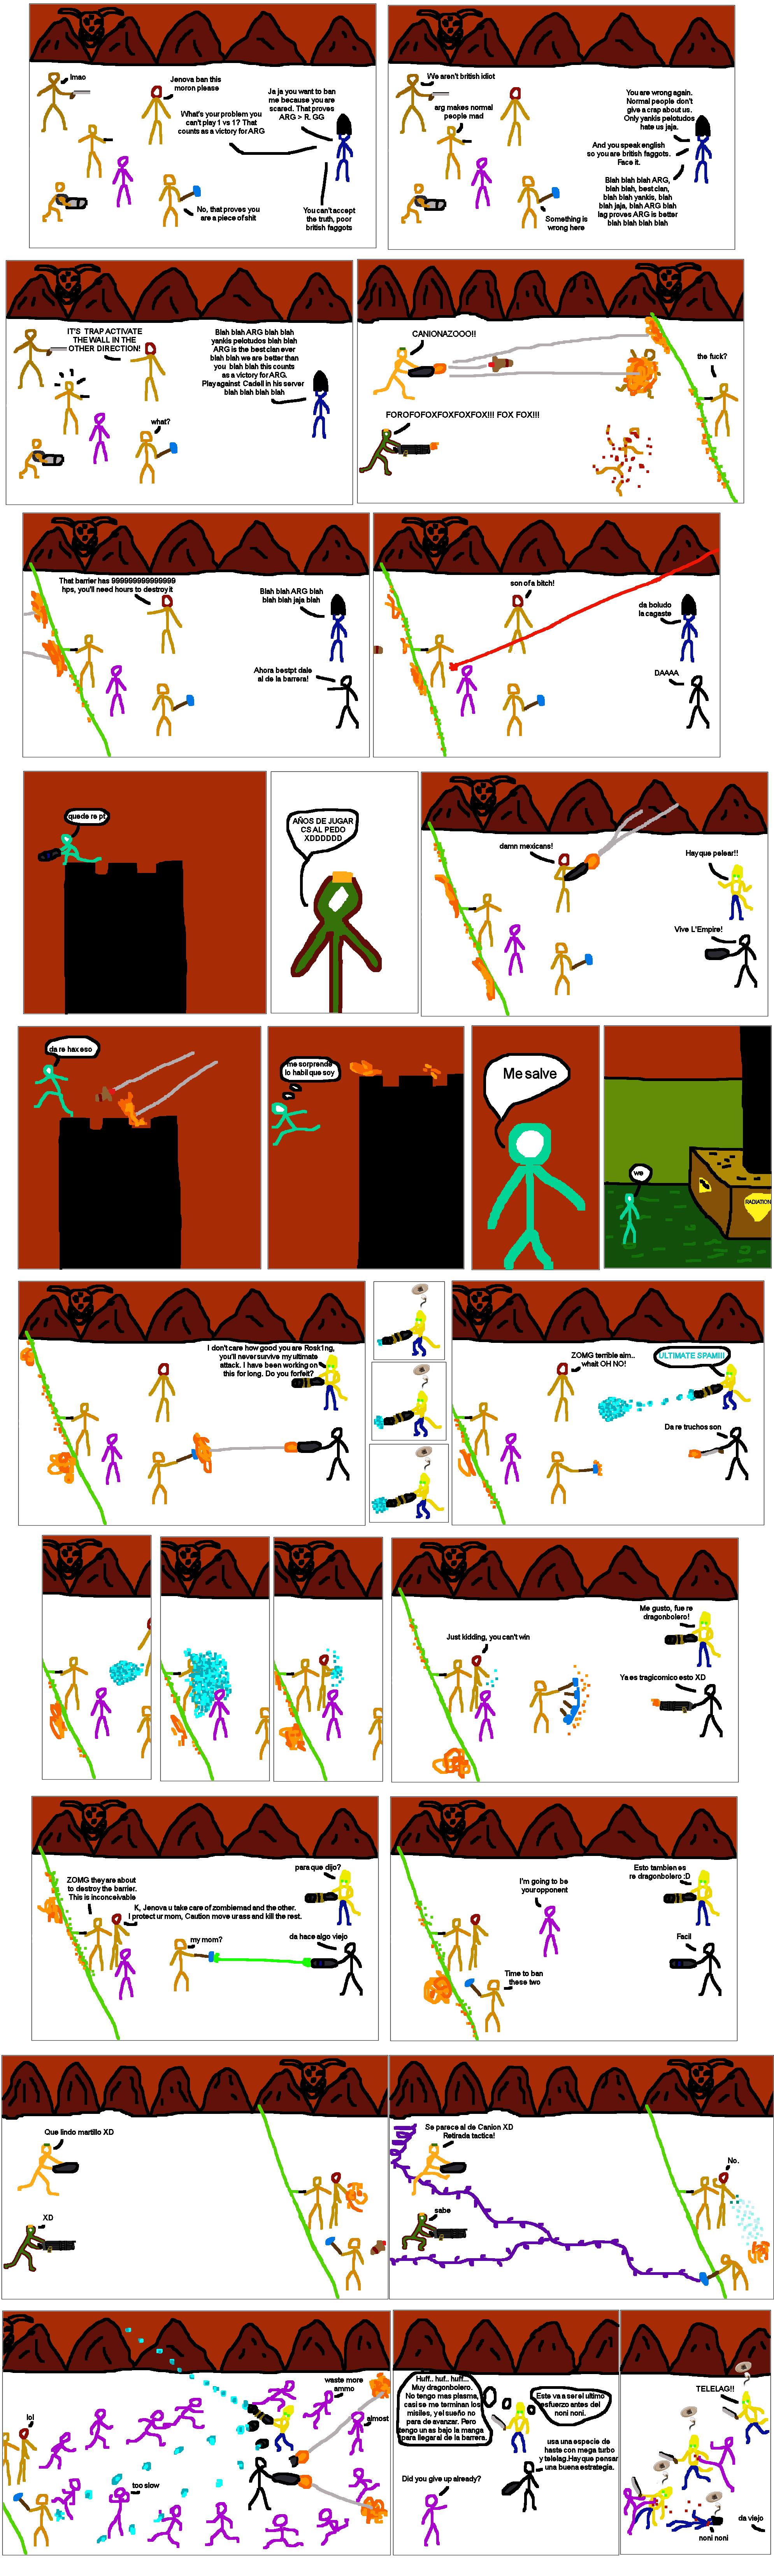 Historieta torneo tlms dragonbolero Pagina_8